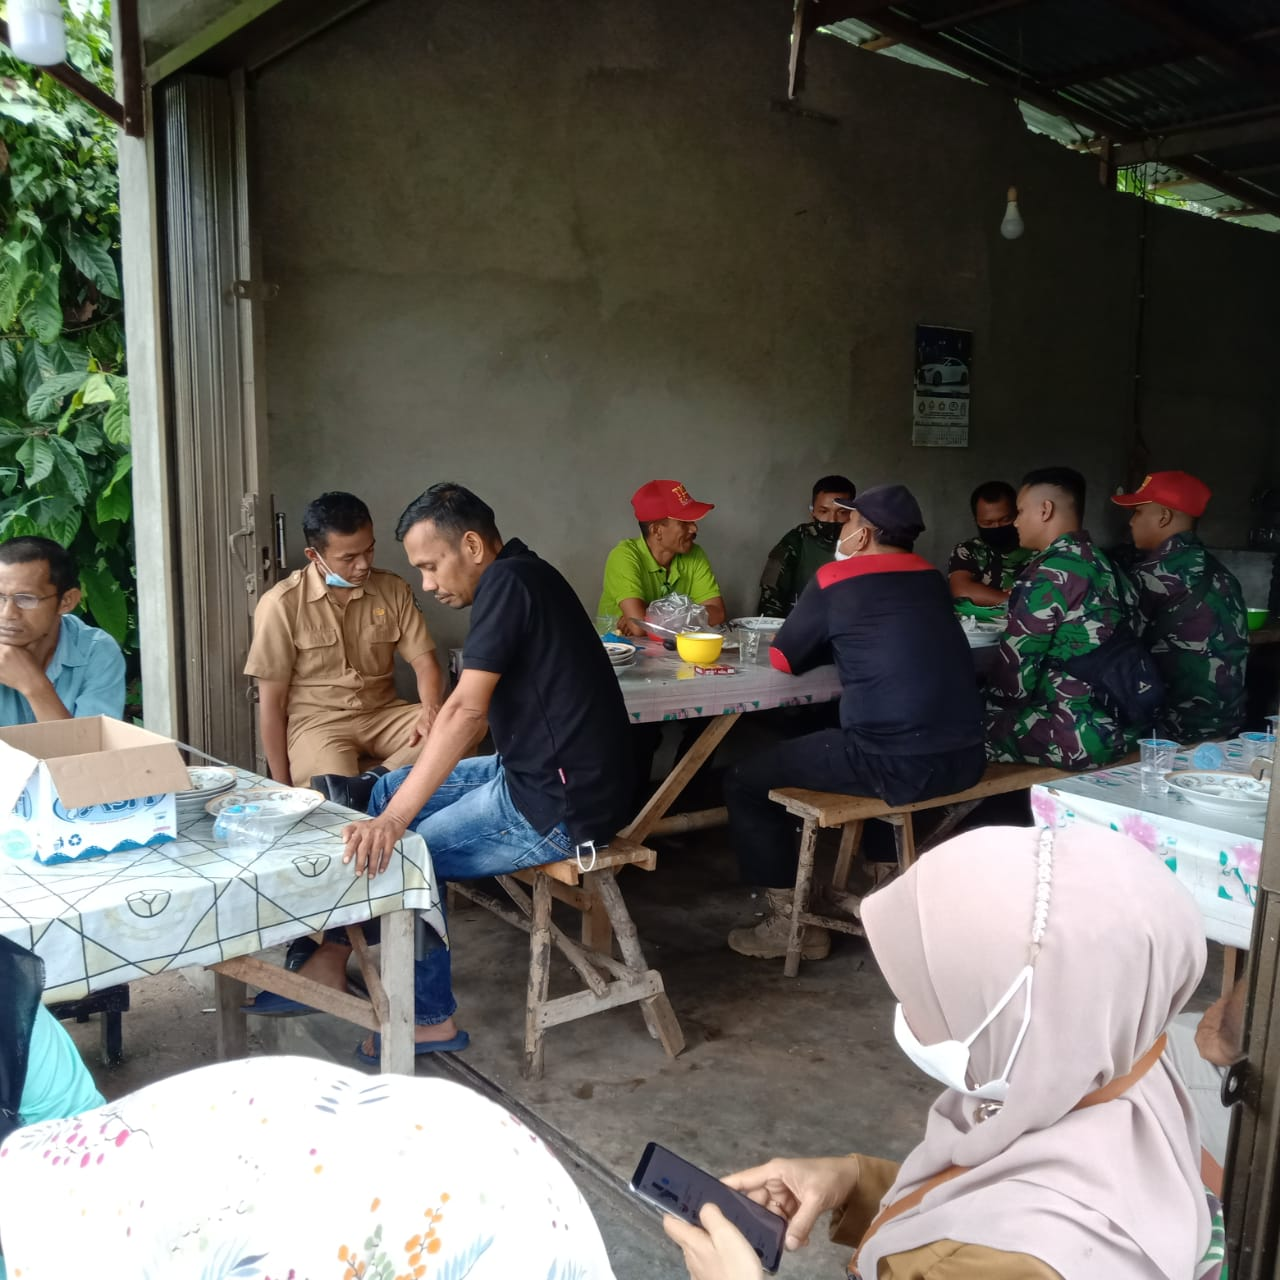 Wali Nagari Talang Maur Beri Jamuan Khusus Pada Anggota Satgas TMMD Pada Akhir Penugasan